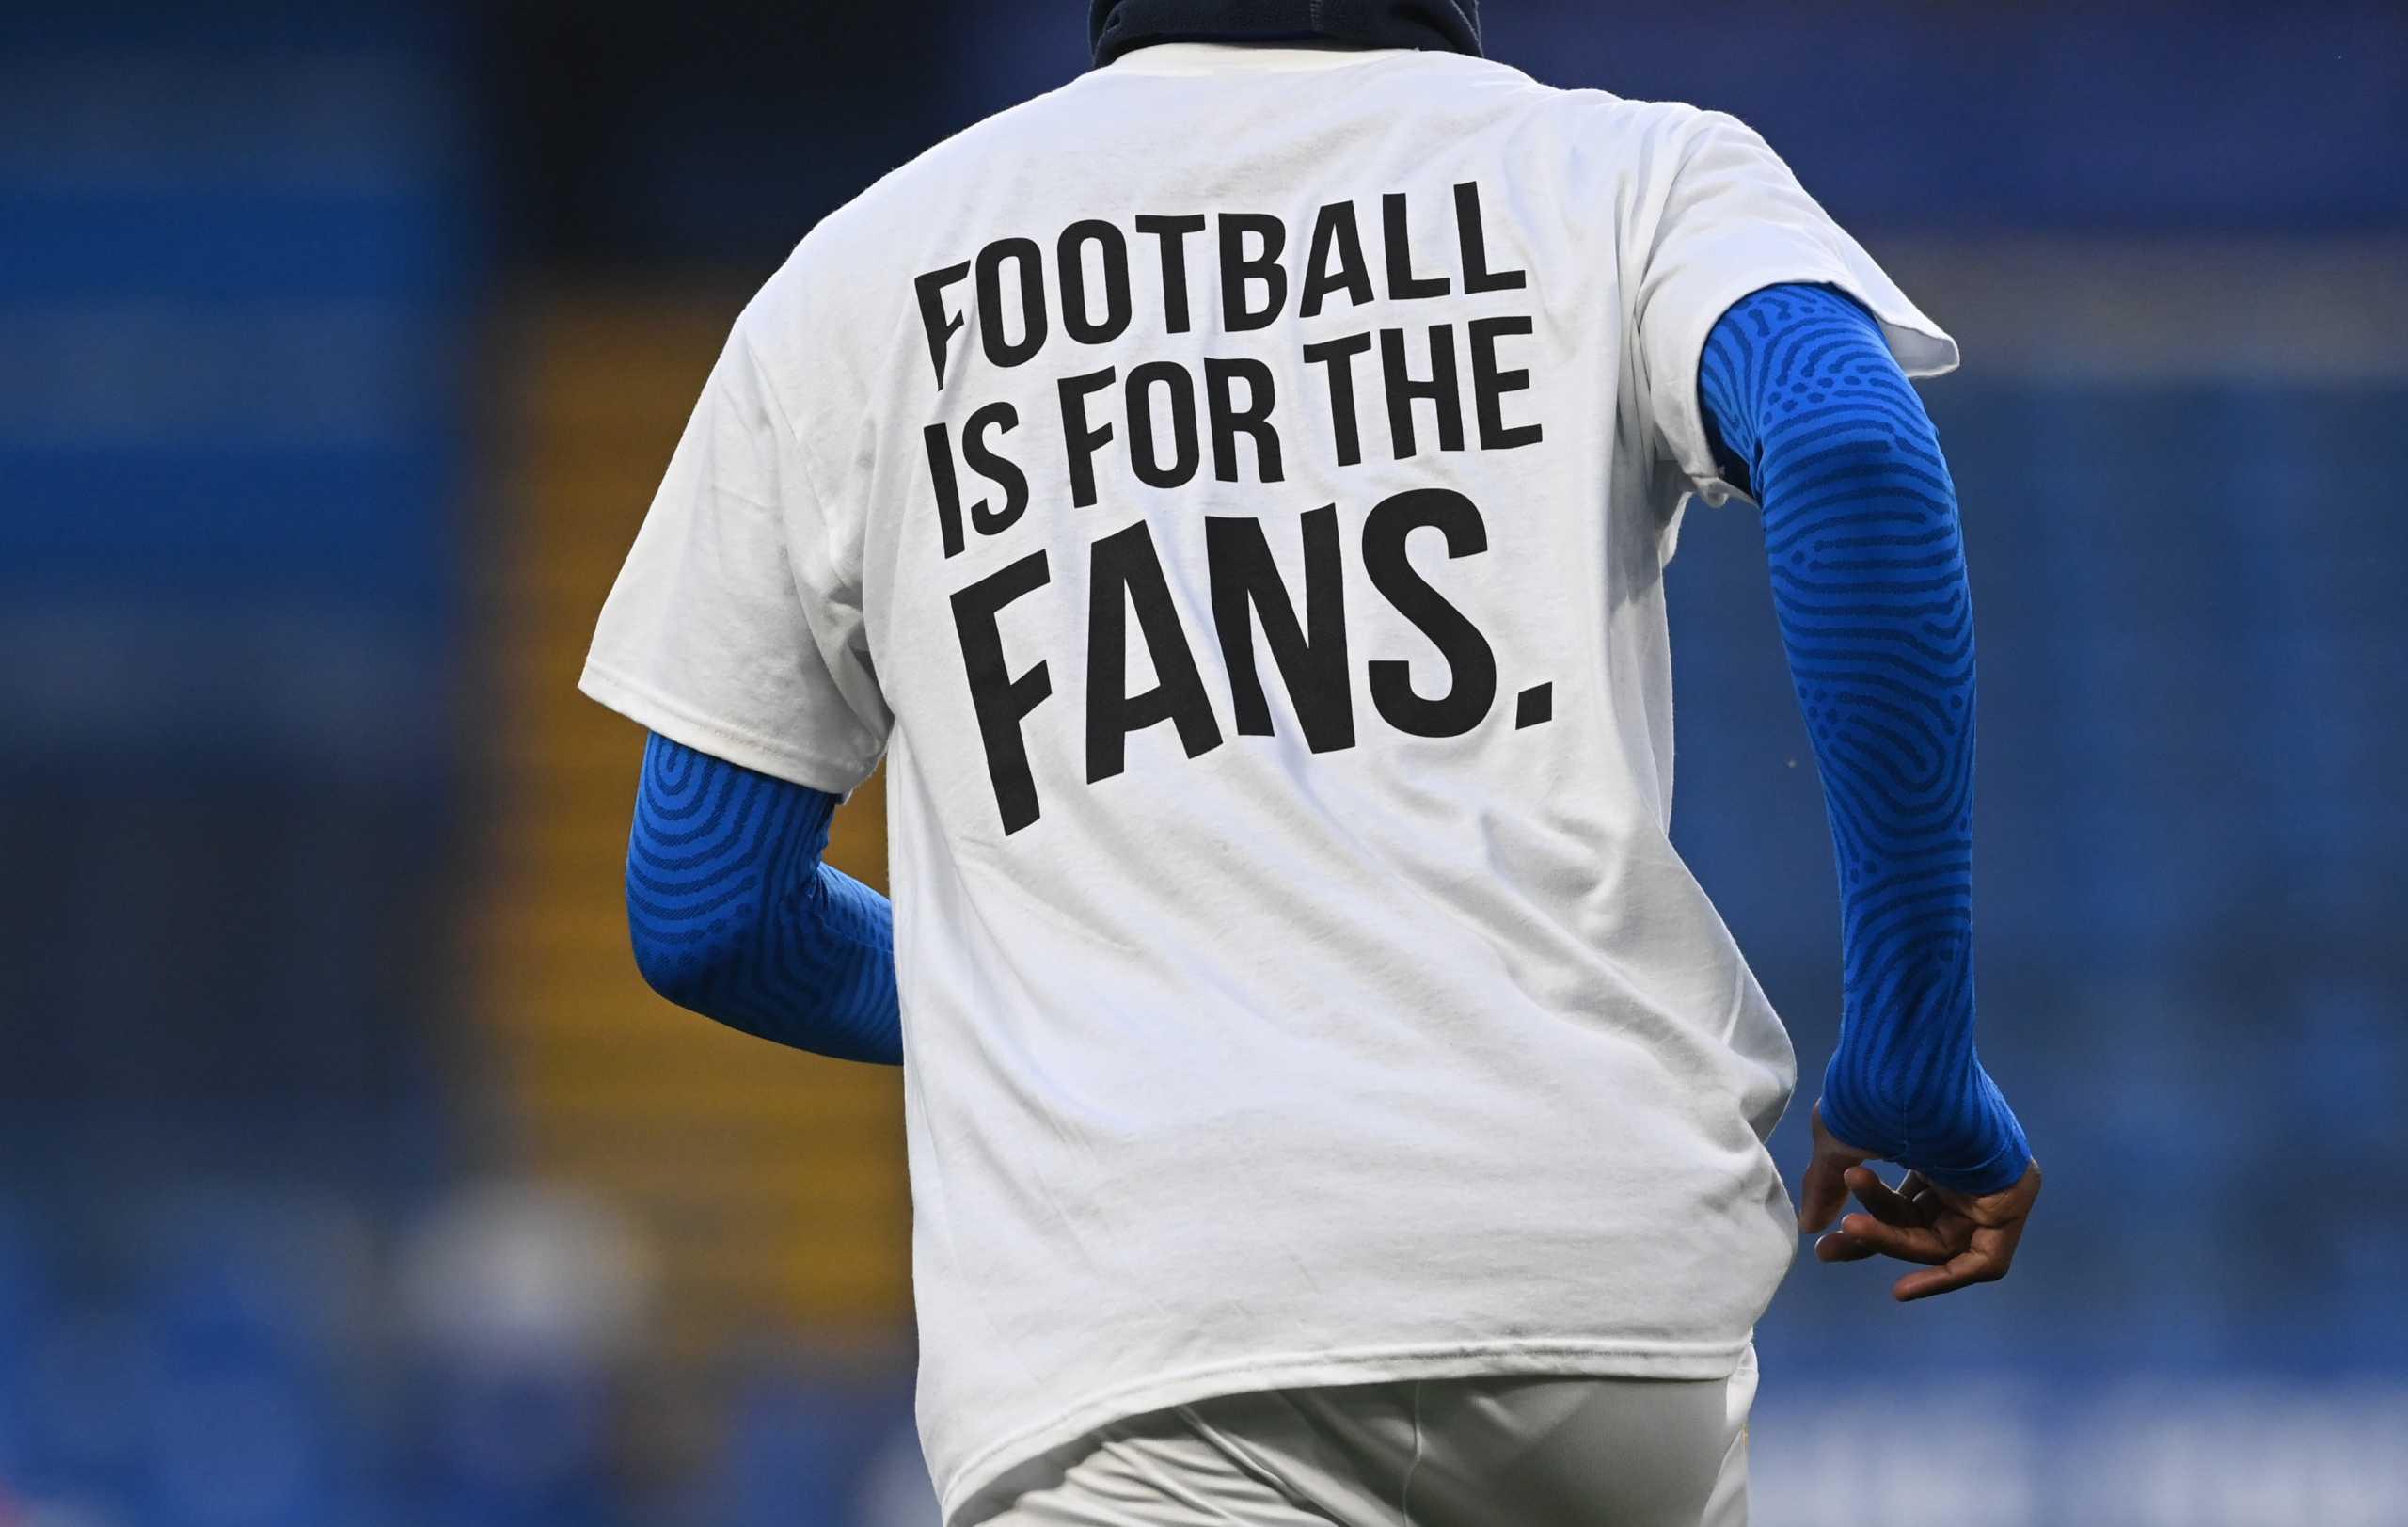 European Super League: Διαλύεται σαν «χάρτινος πύργος» – Ο τελευταίος να κλείσει την πόρτα